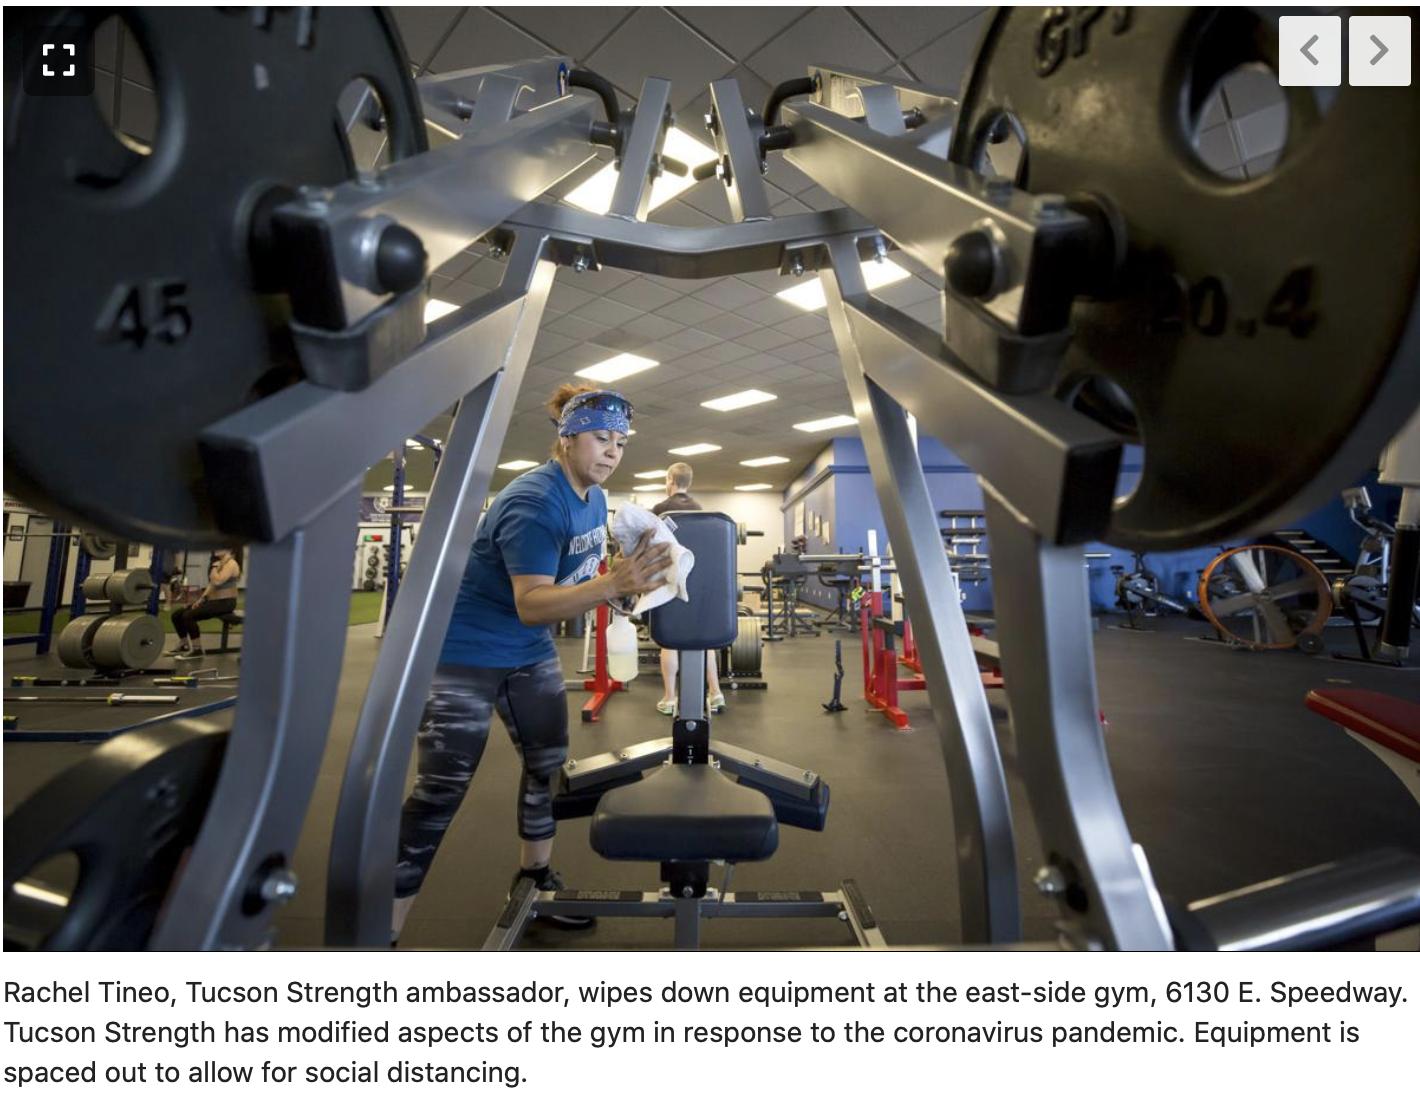 Tucson Strength gyms